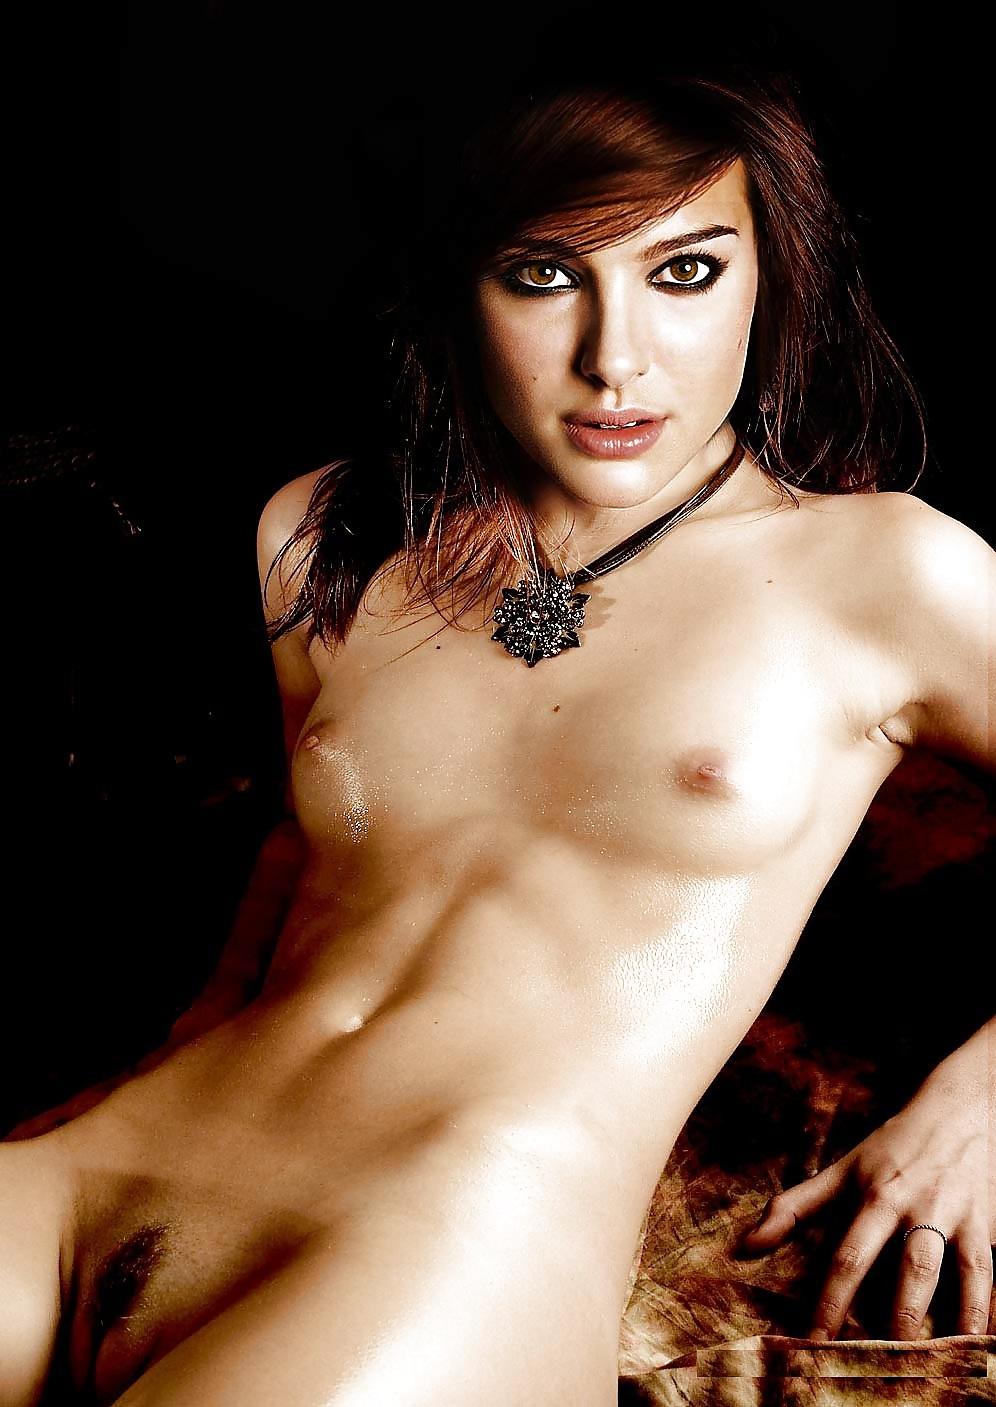 Natalie portman erotic